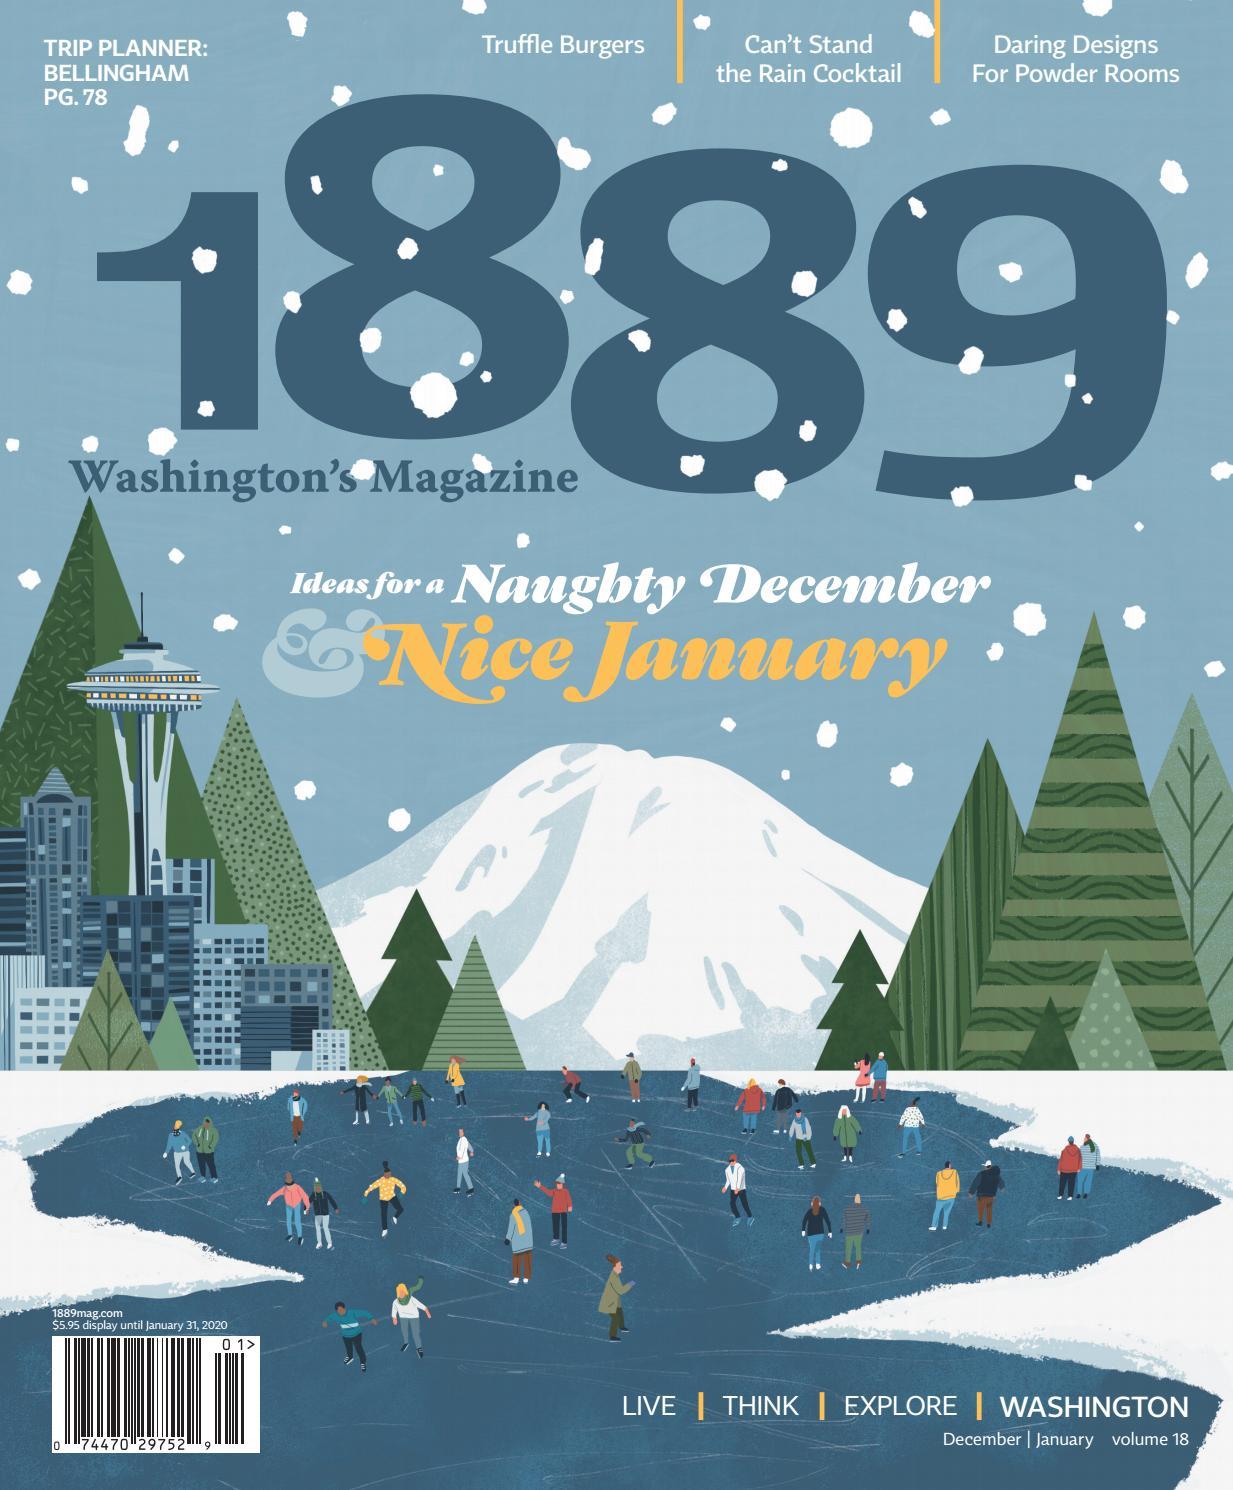 Odds That Lake Chelan Wa. Has Snow For Christmas 2020 1889 Washington's Magazine | December/January 2019 by Statehood